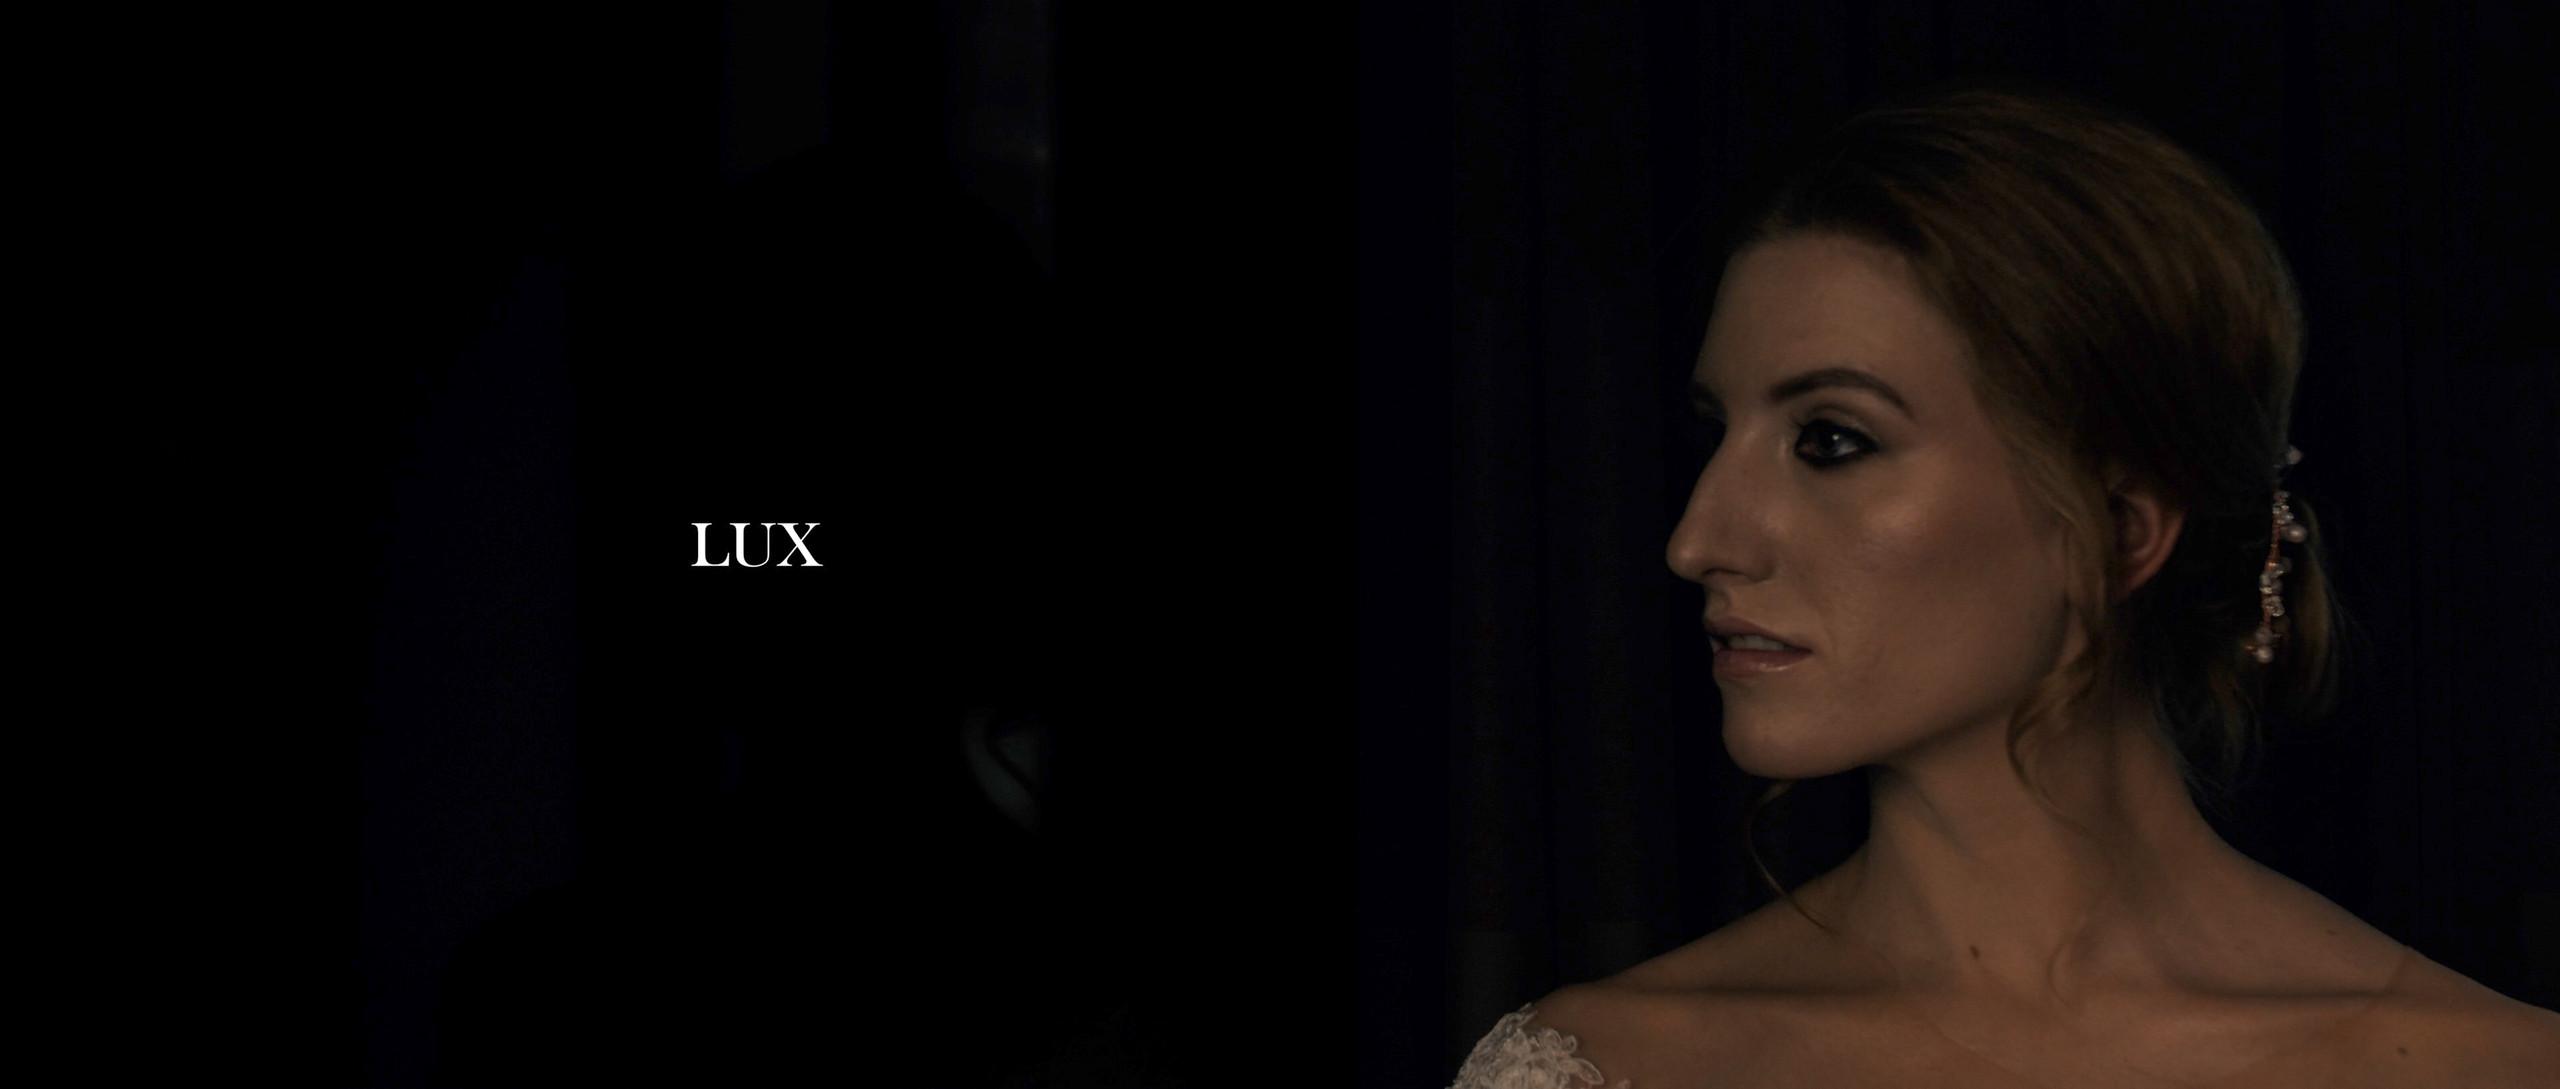 Lux london wedding films videographer